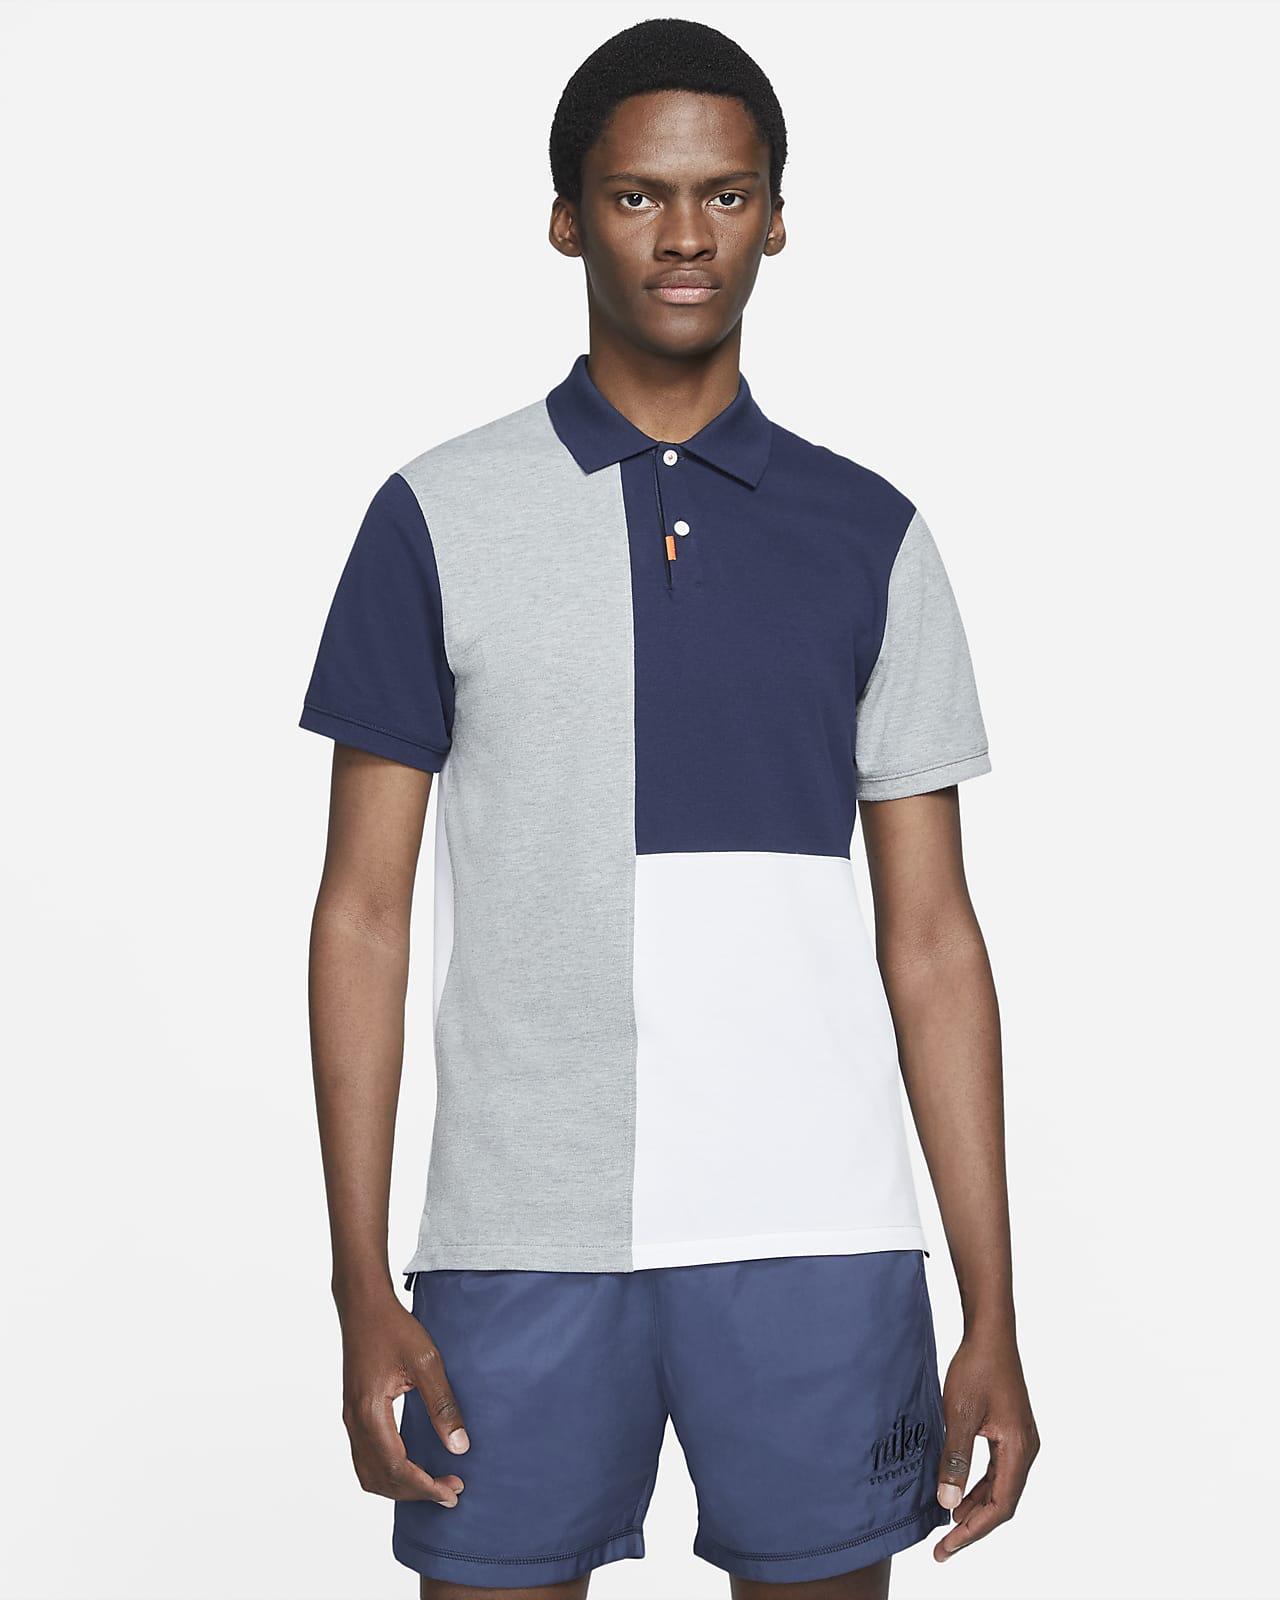 The Nike Polo Men's Colour-Blocked Slim Fit Polo